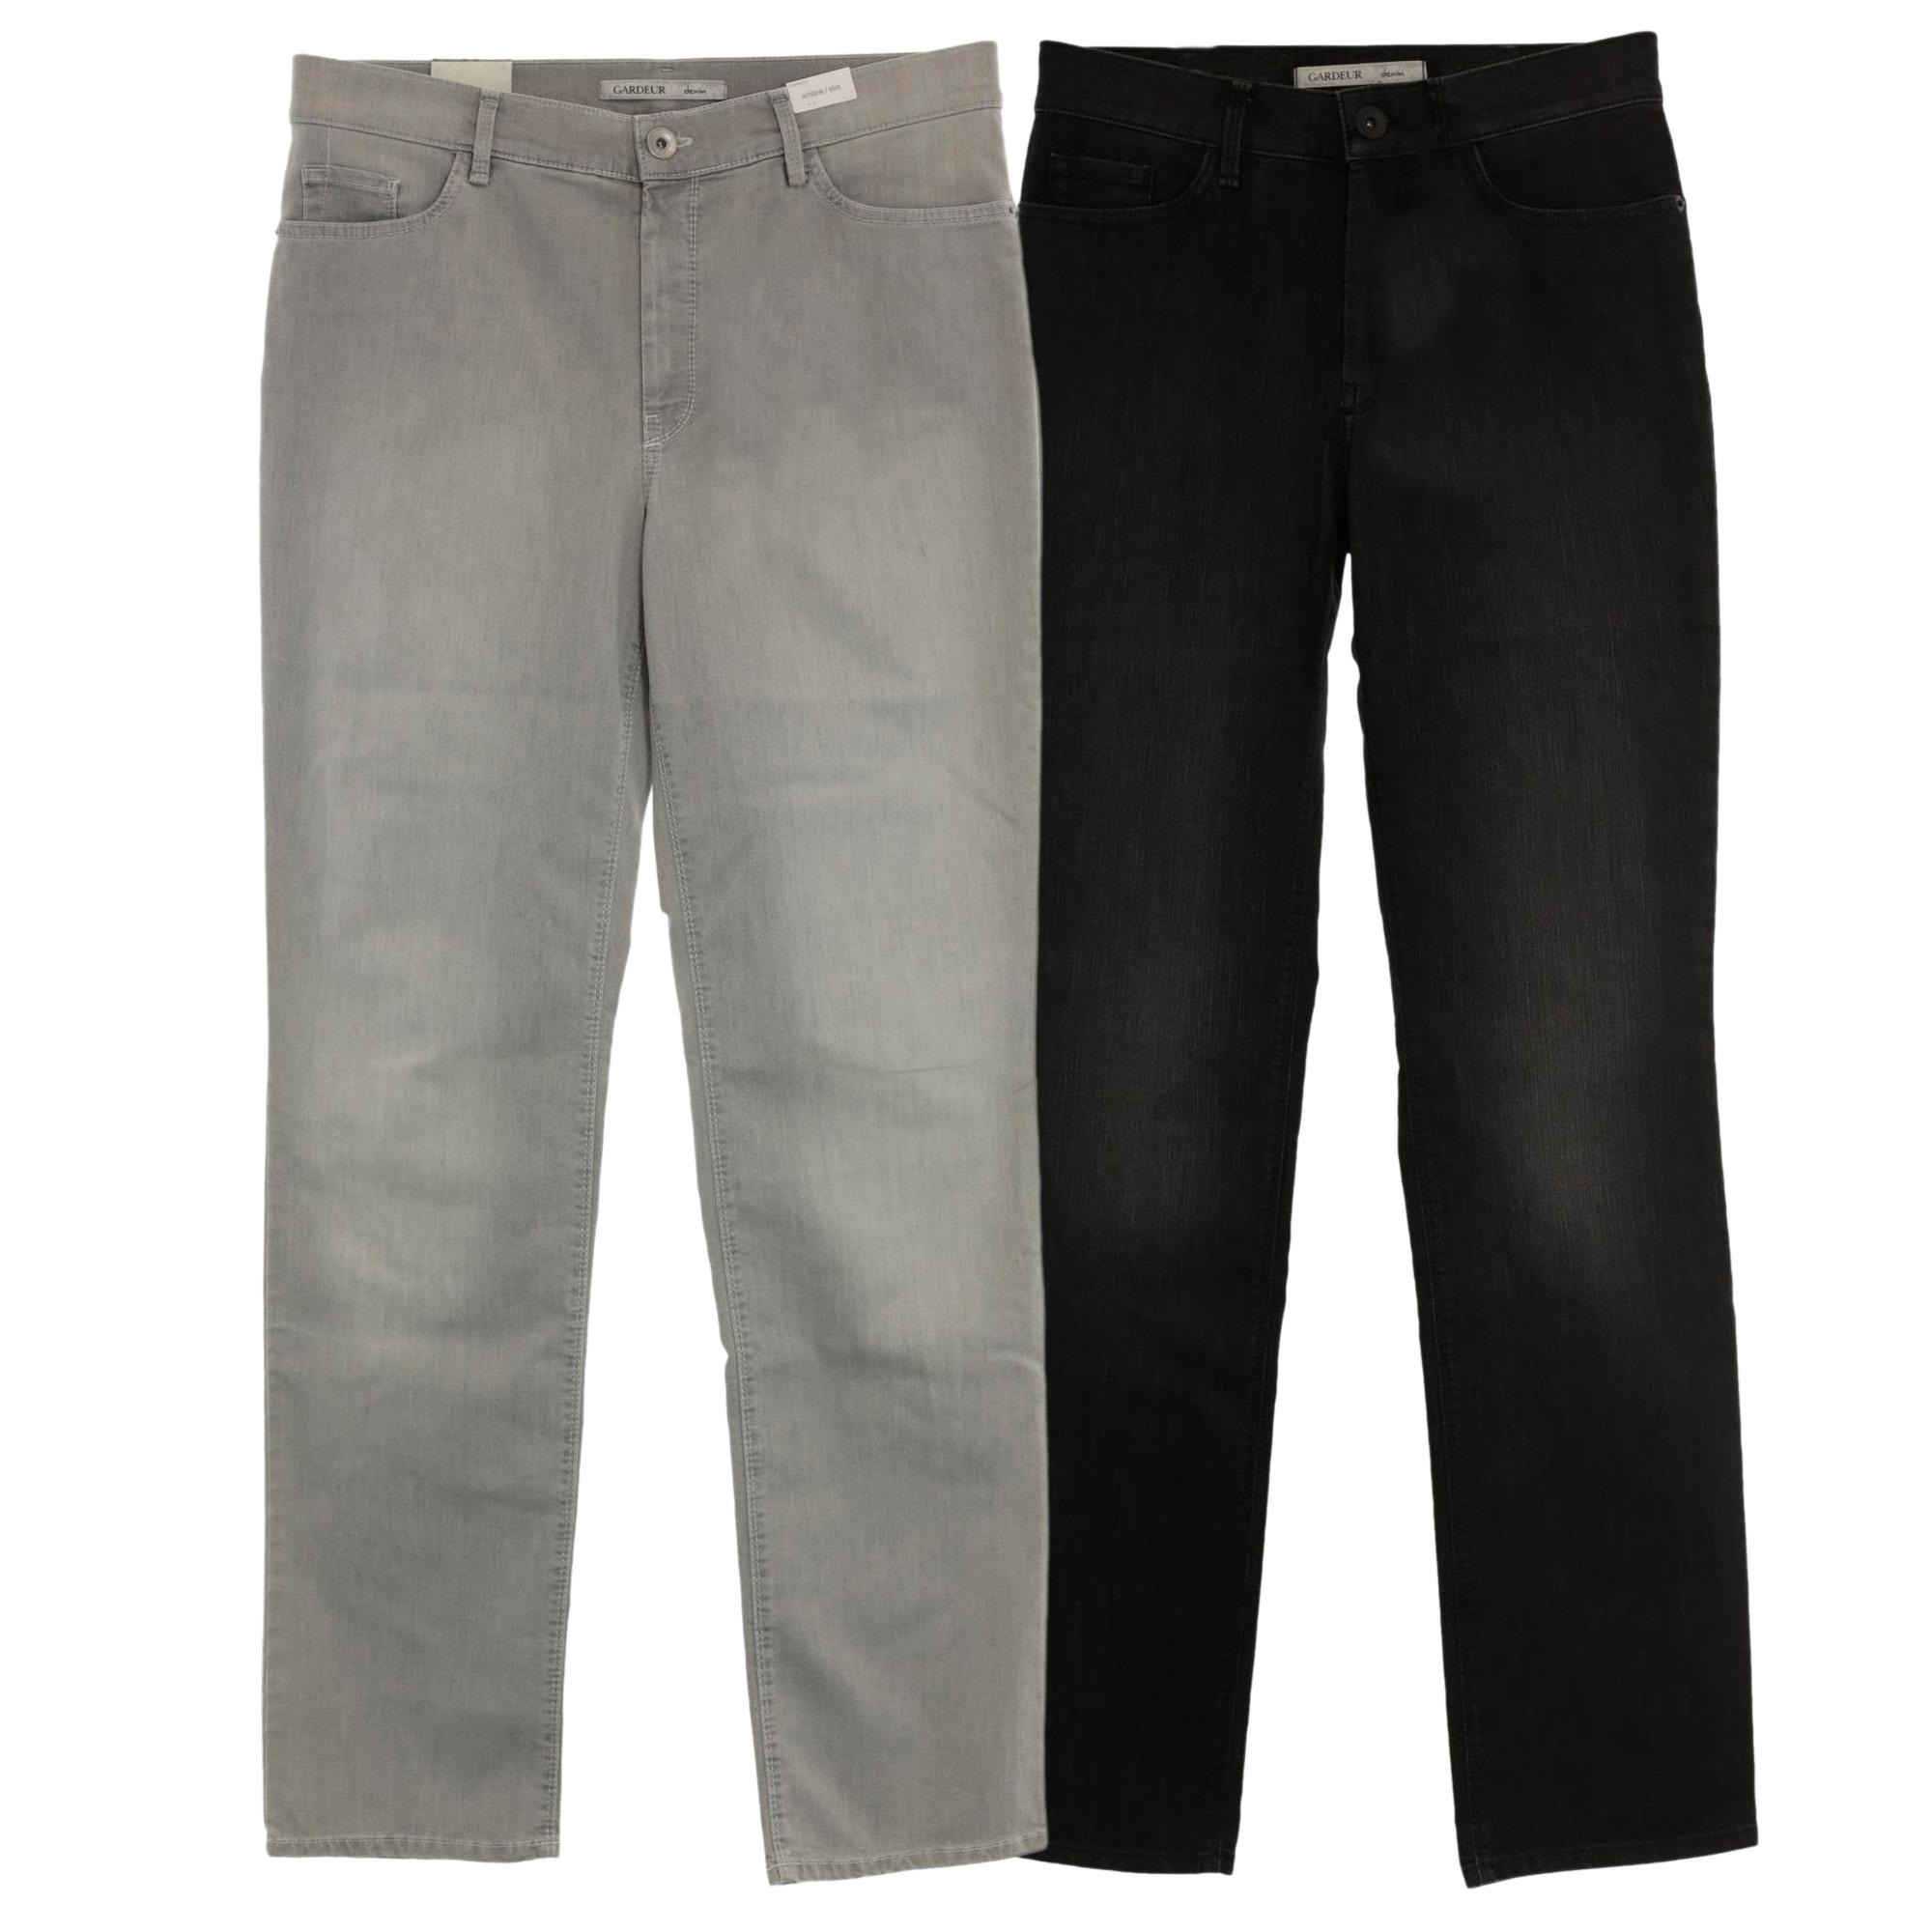 Gardeur jeans Inga señora elásticos slim fit